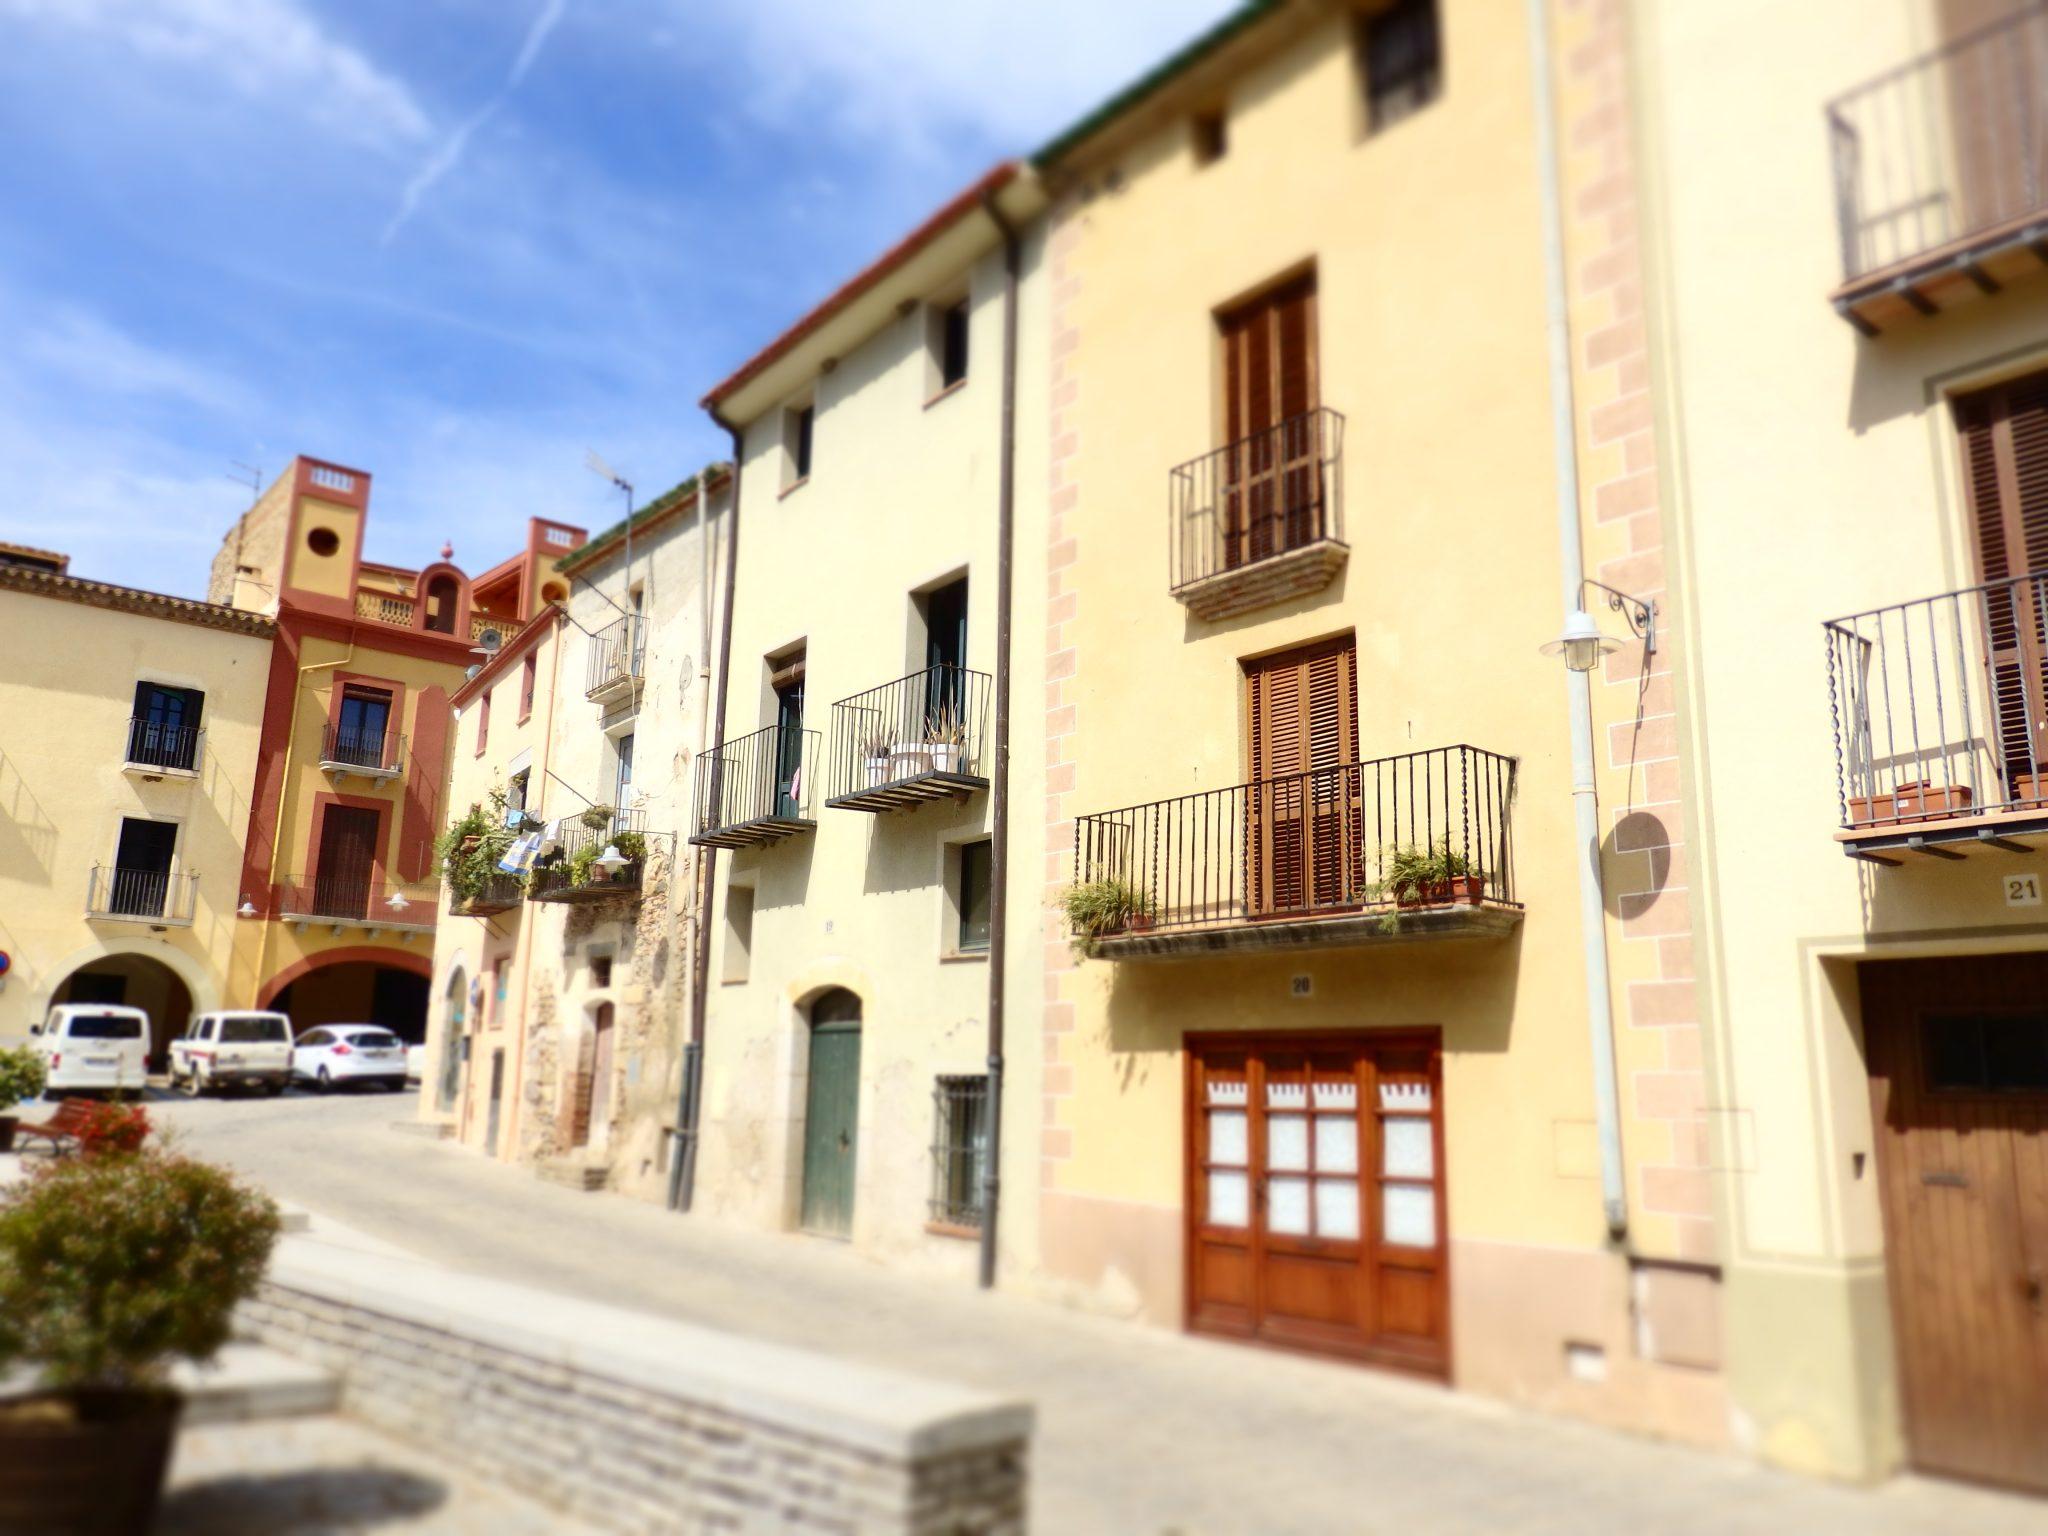 a pretty row of houses in Peratallada in the Baix Emporda, Spain